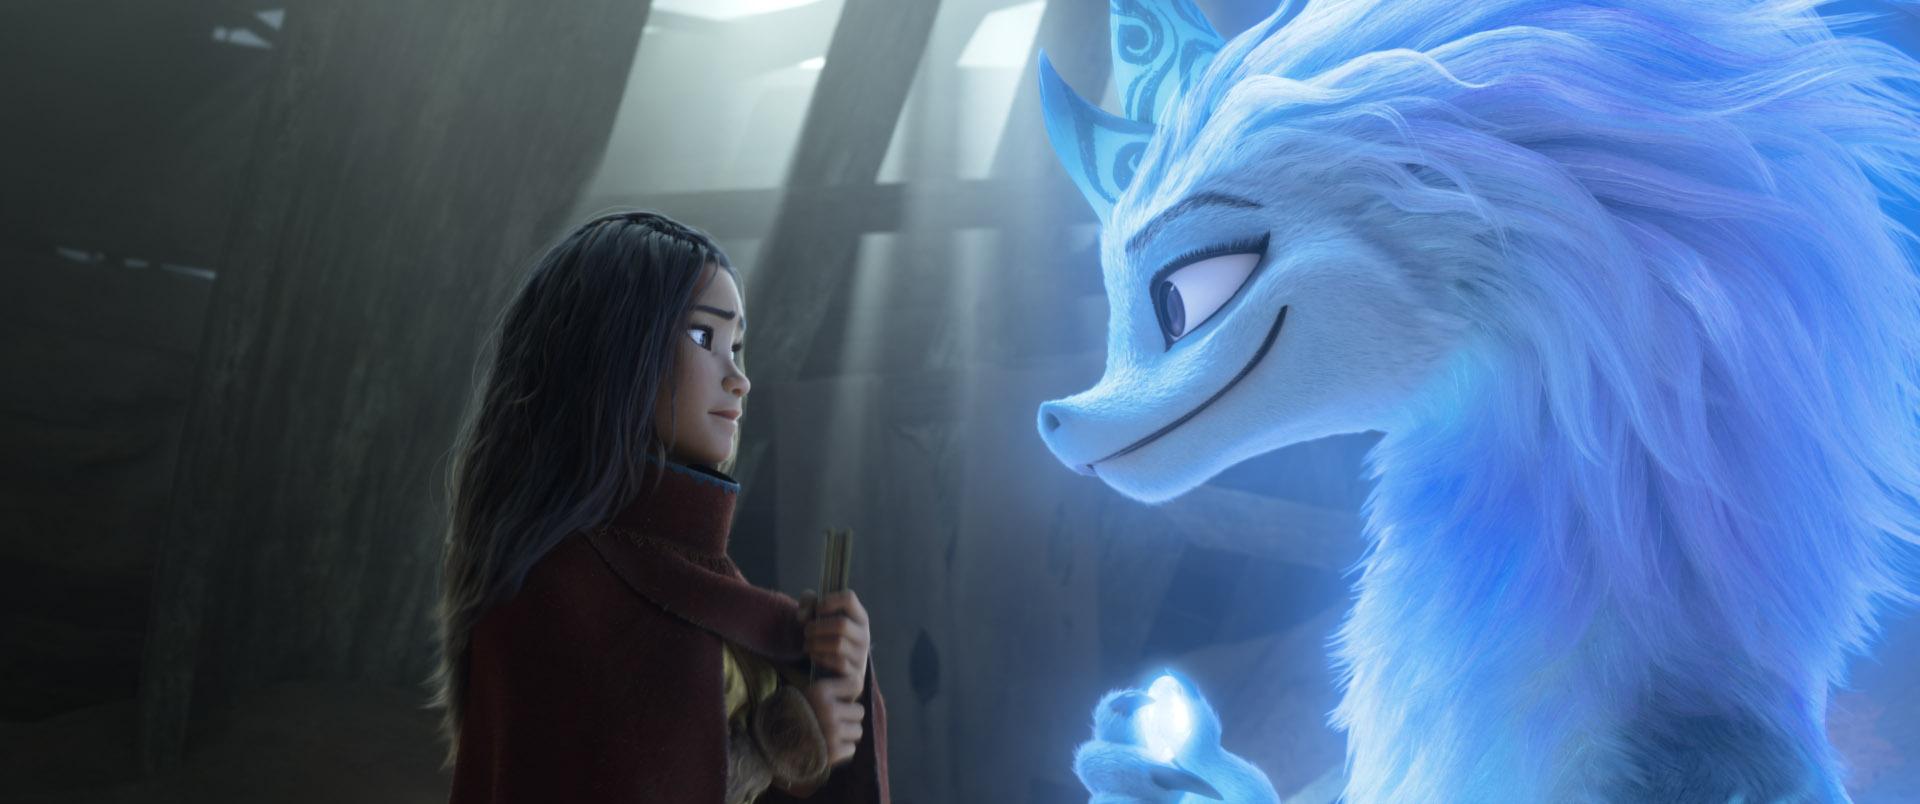 Raya and the Last Dragon Characters